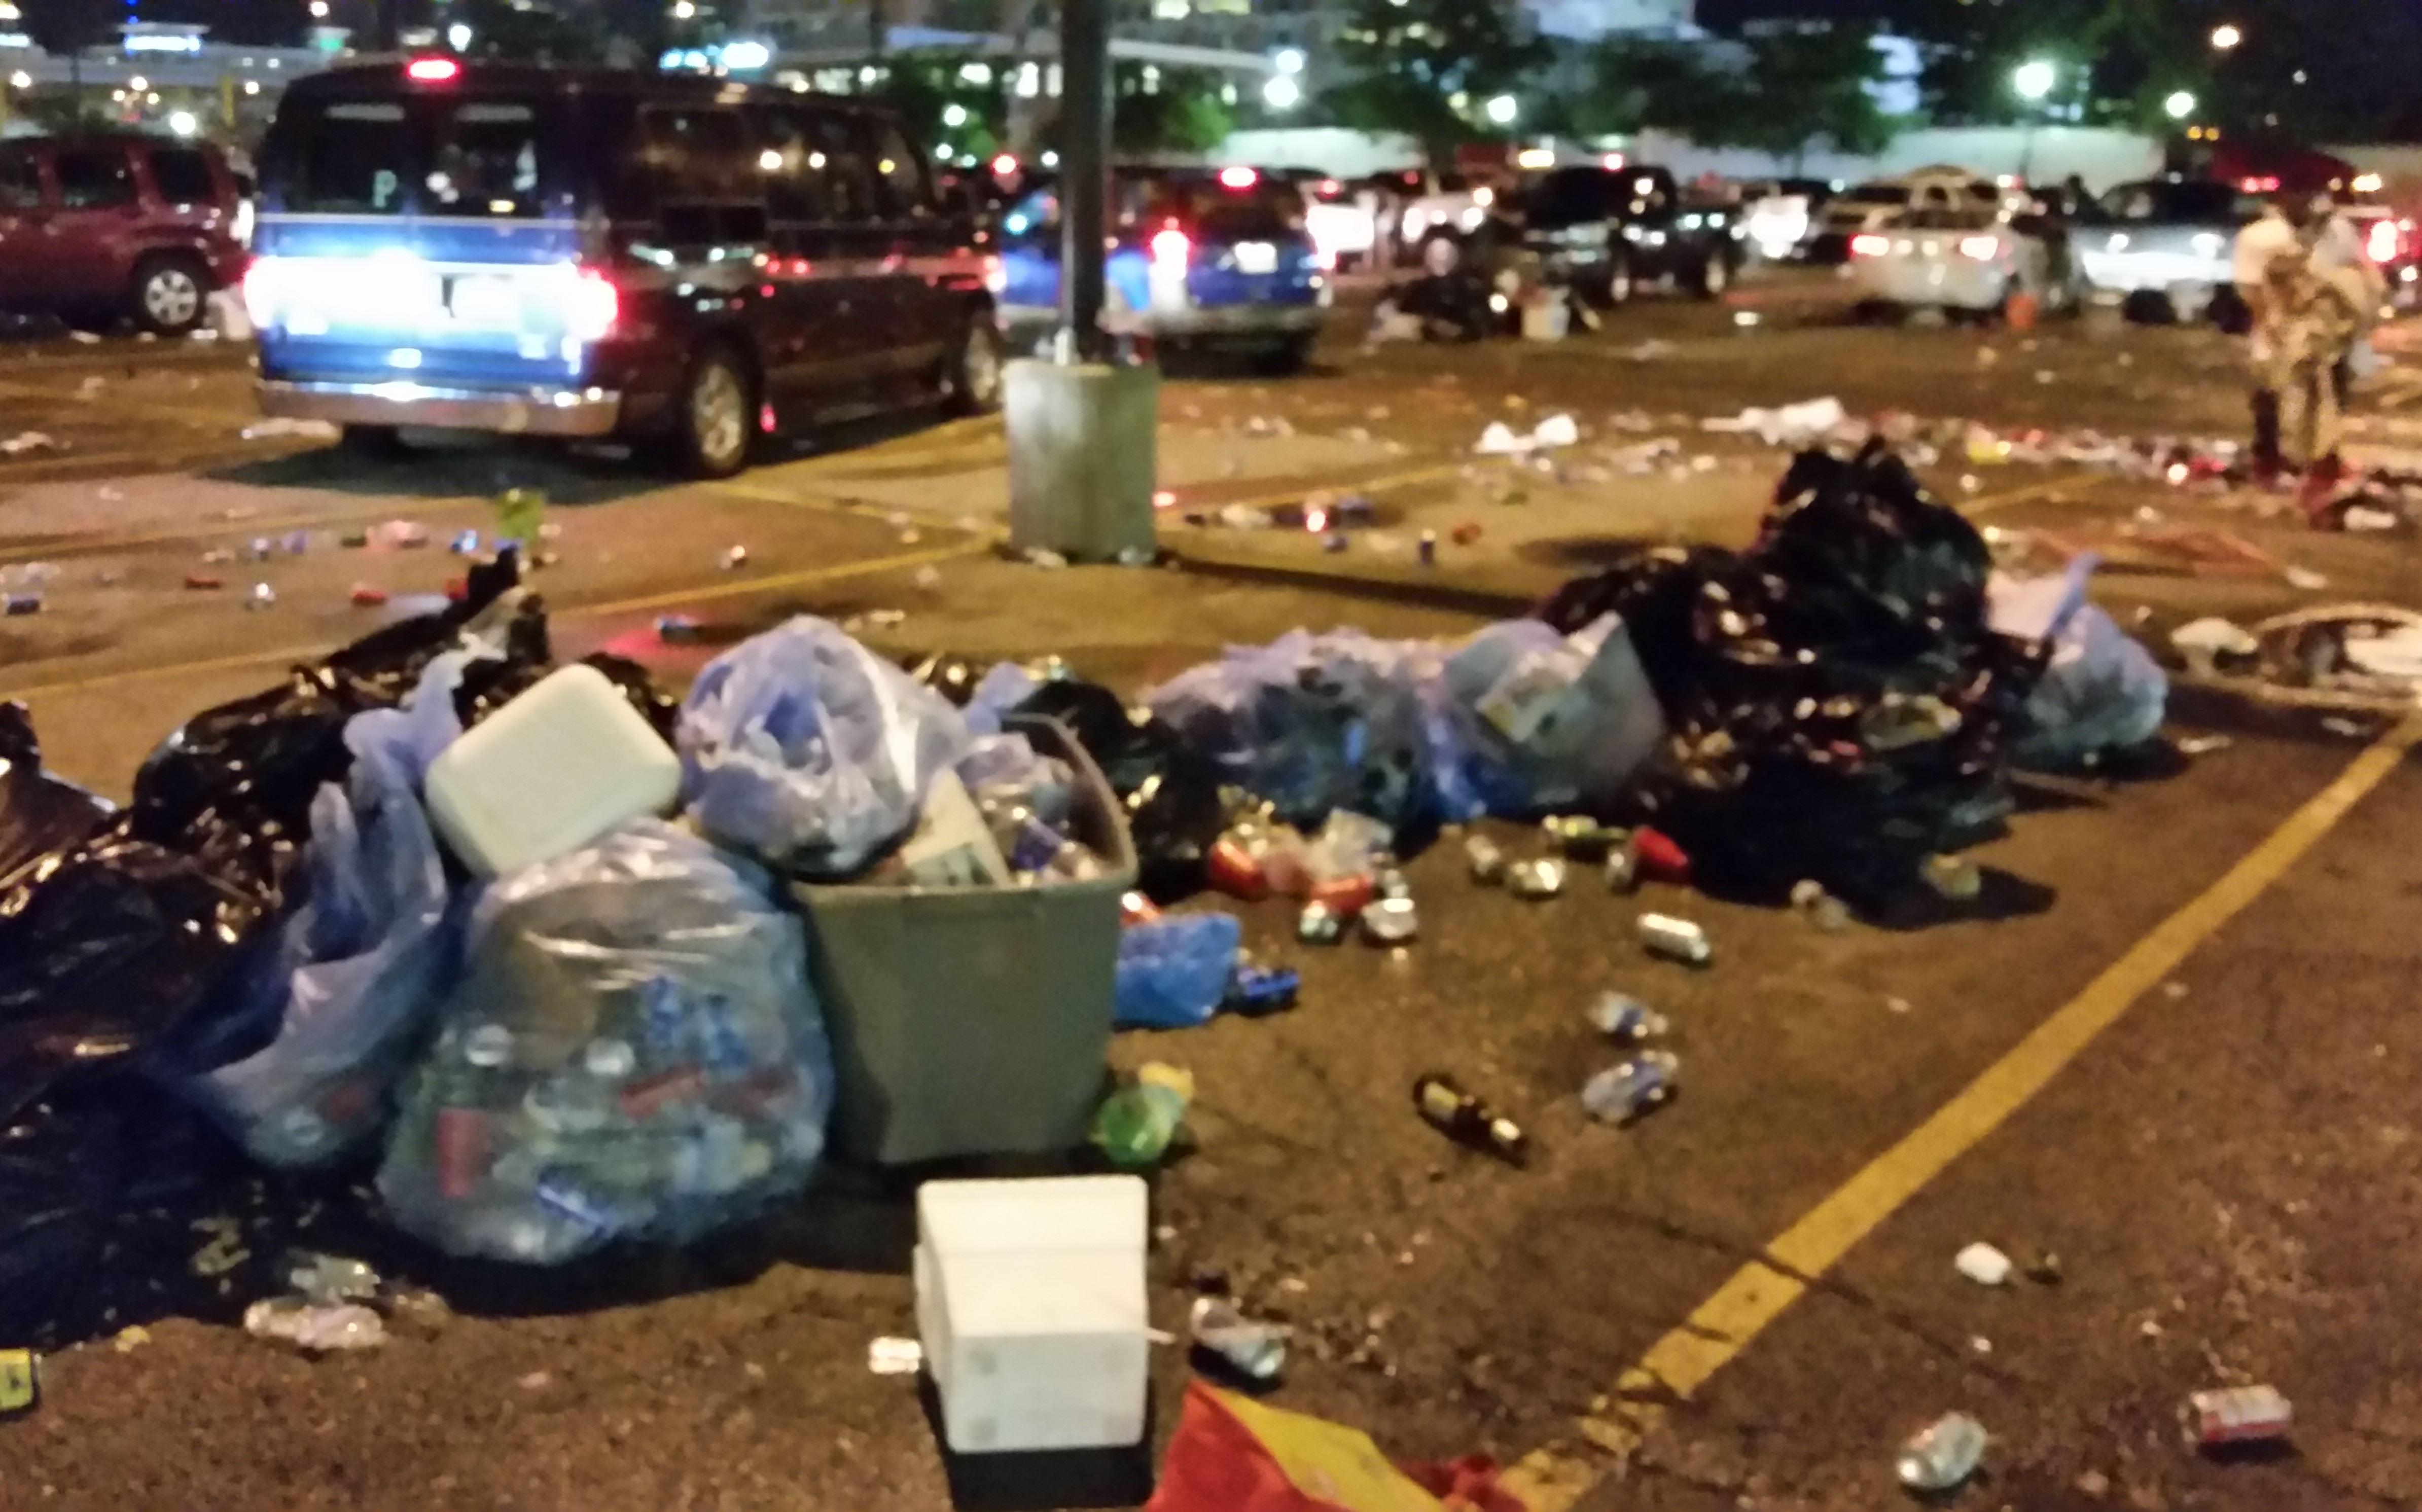 The Trash Pack 3 Liquid Ooze